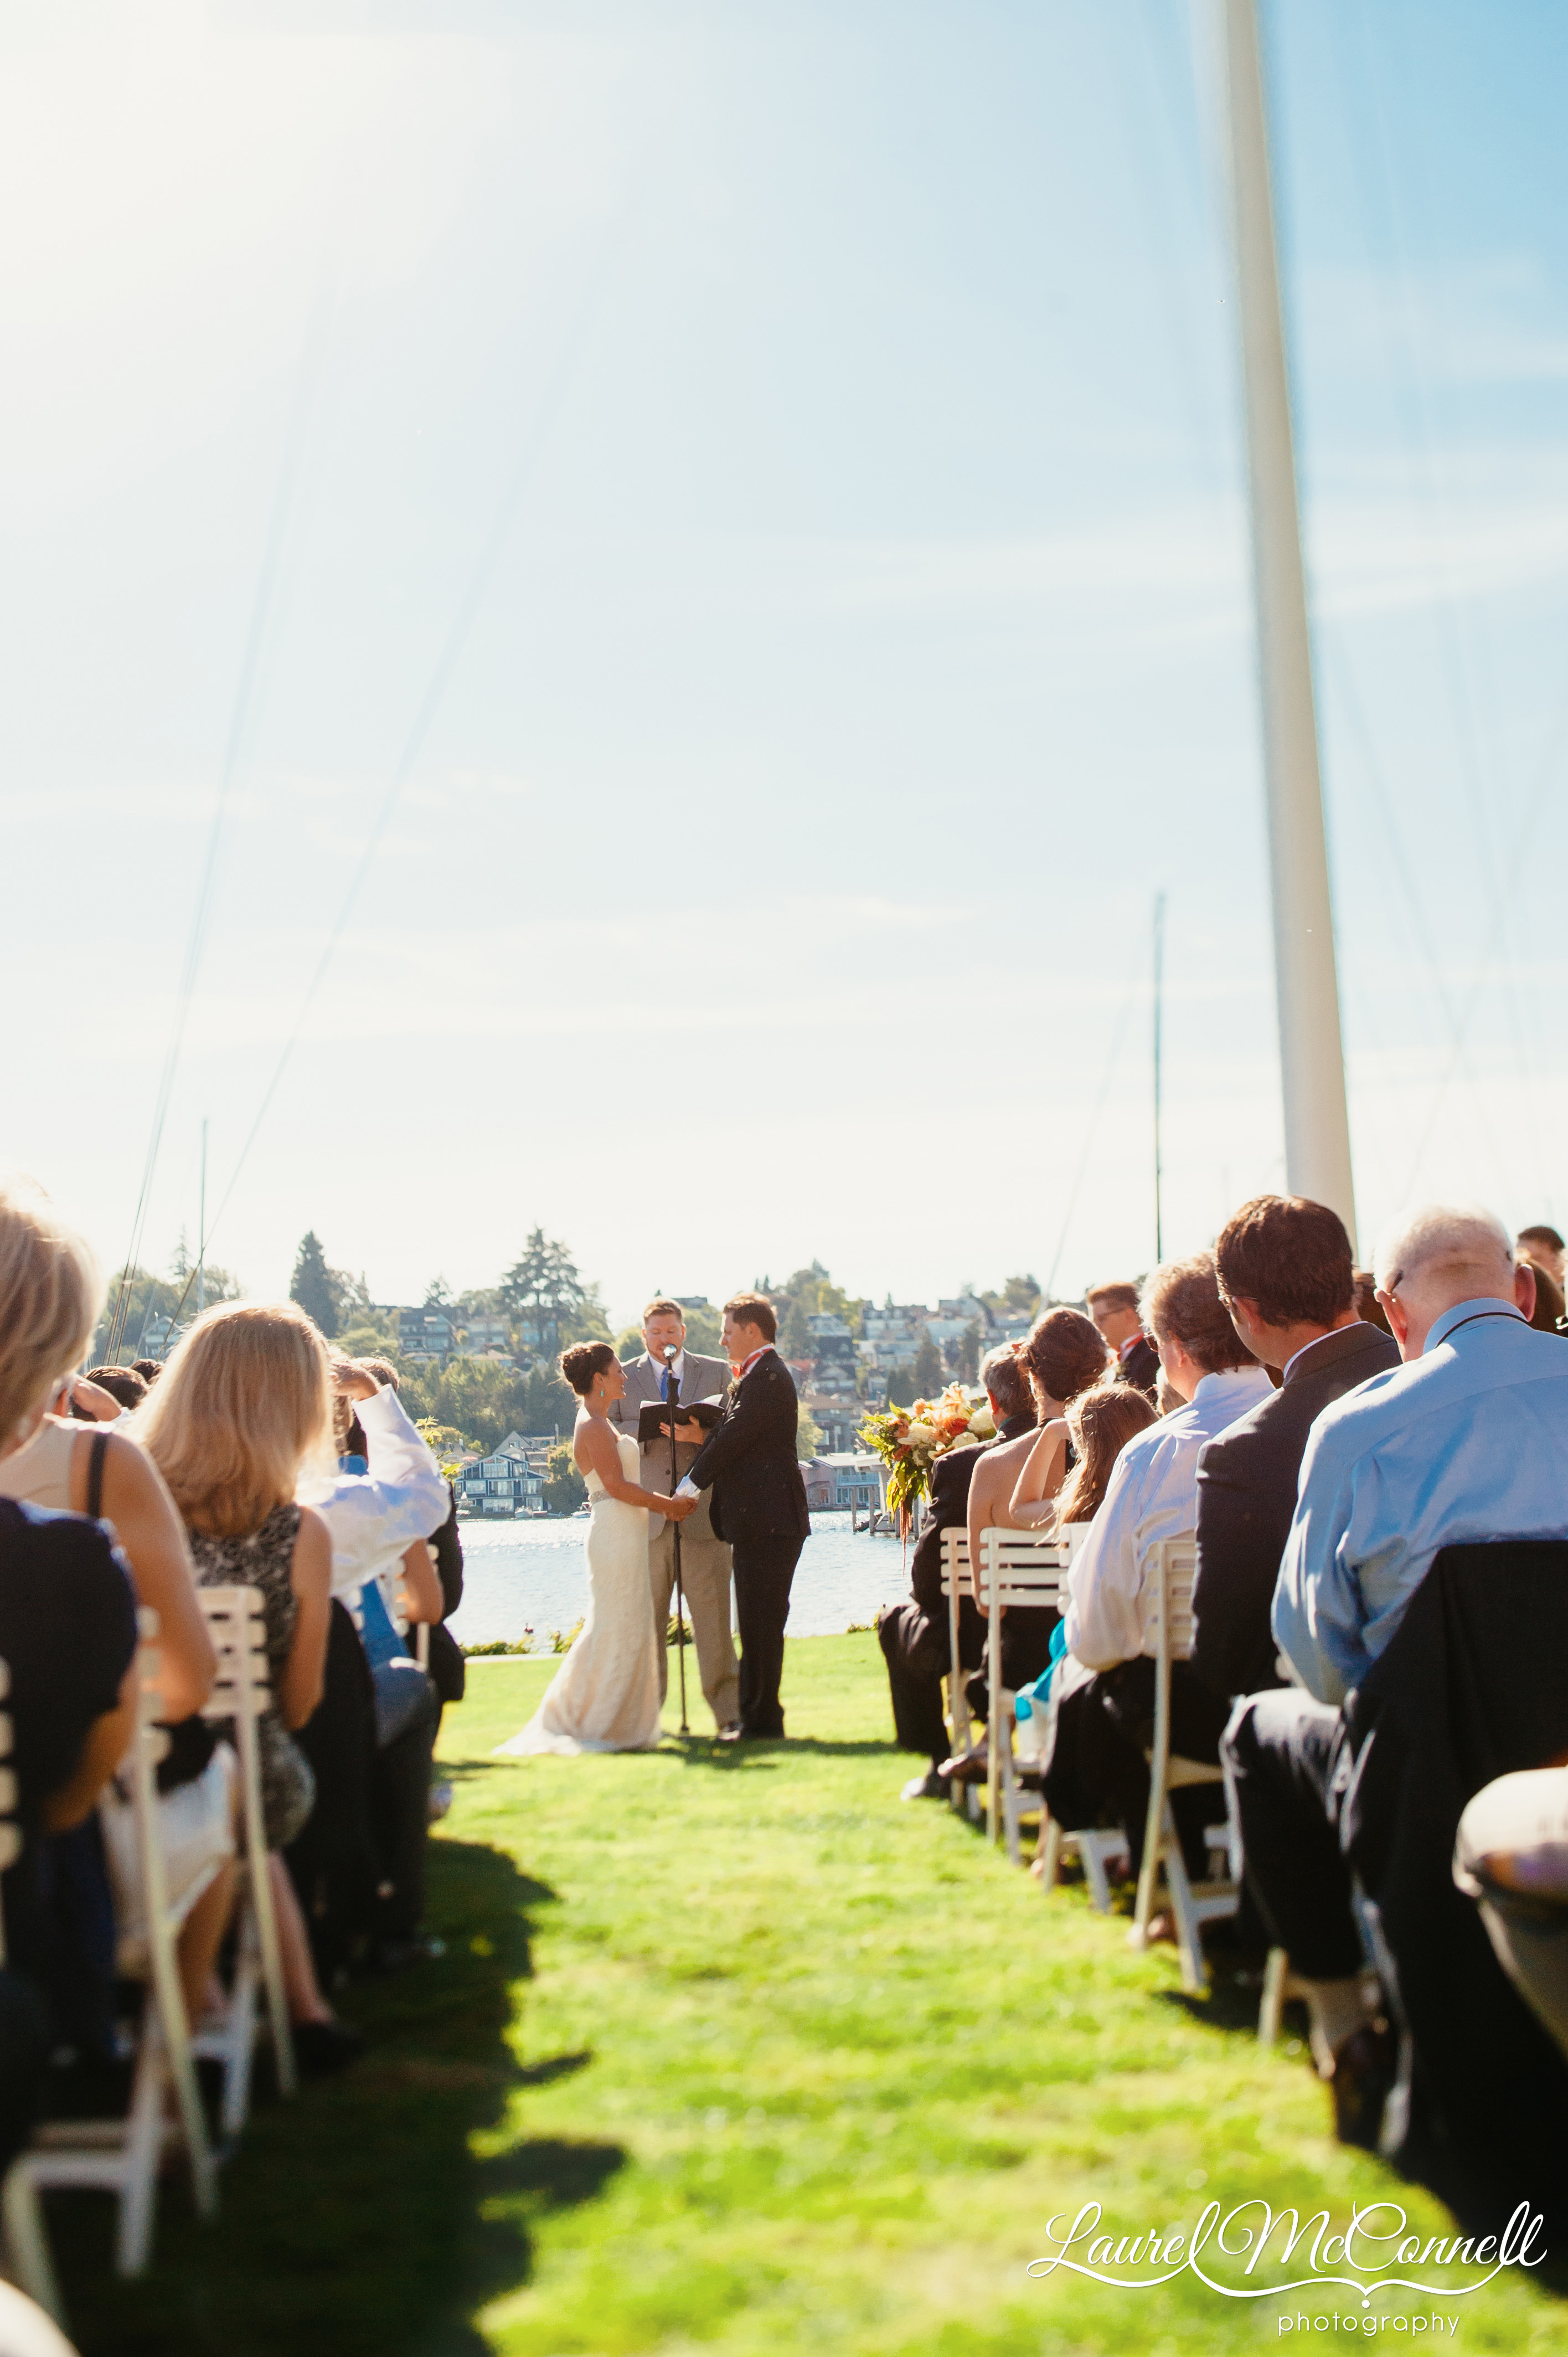 Seattle Yacht Club wedding overlooking Portage Bay Lake Union Seattle, Washington Laurel McConnell Photography.